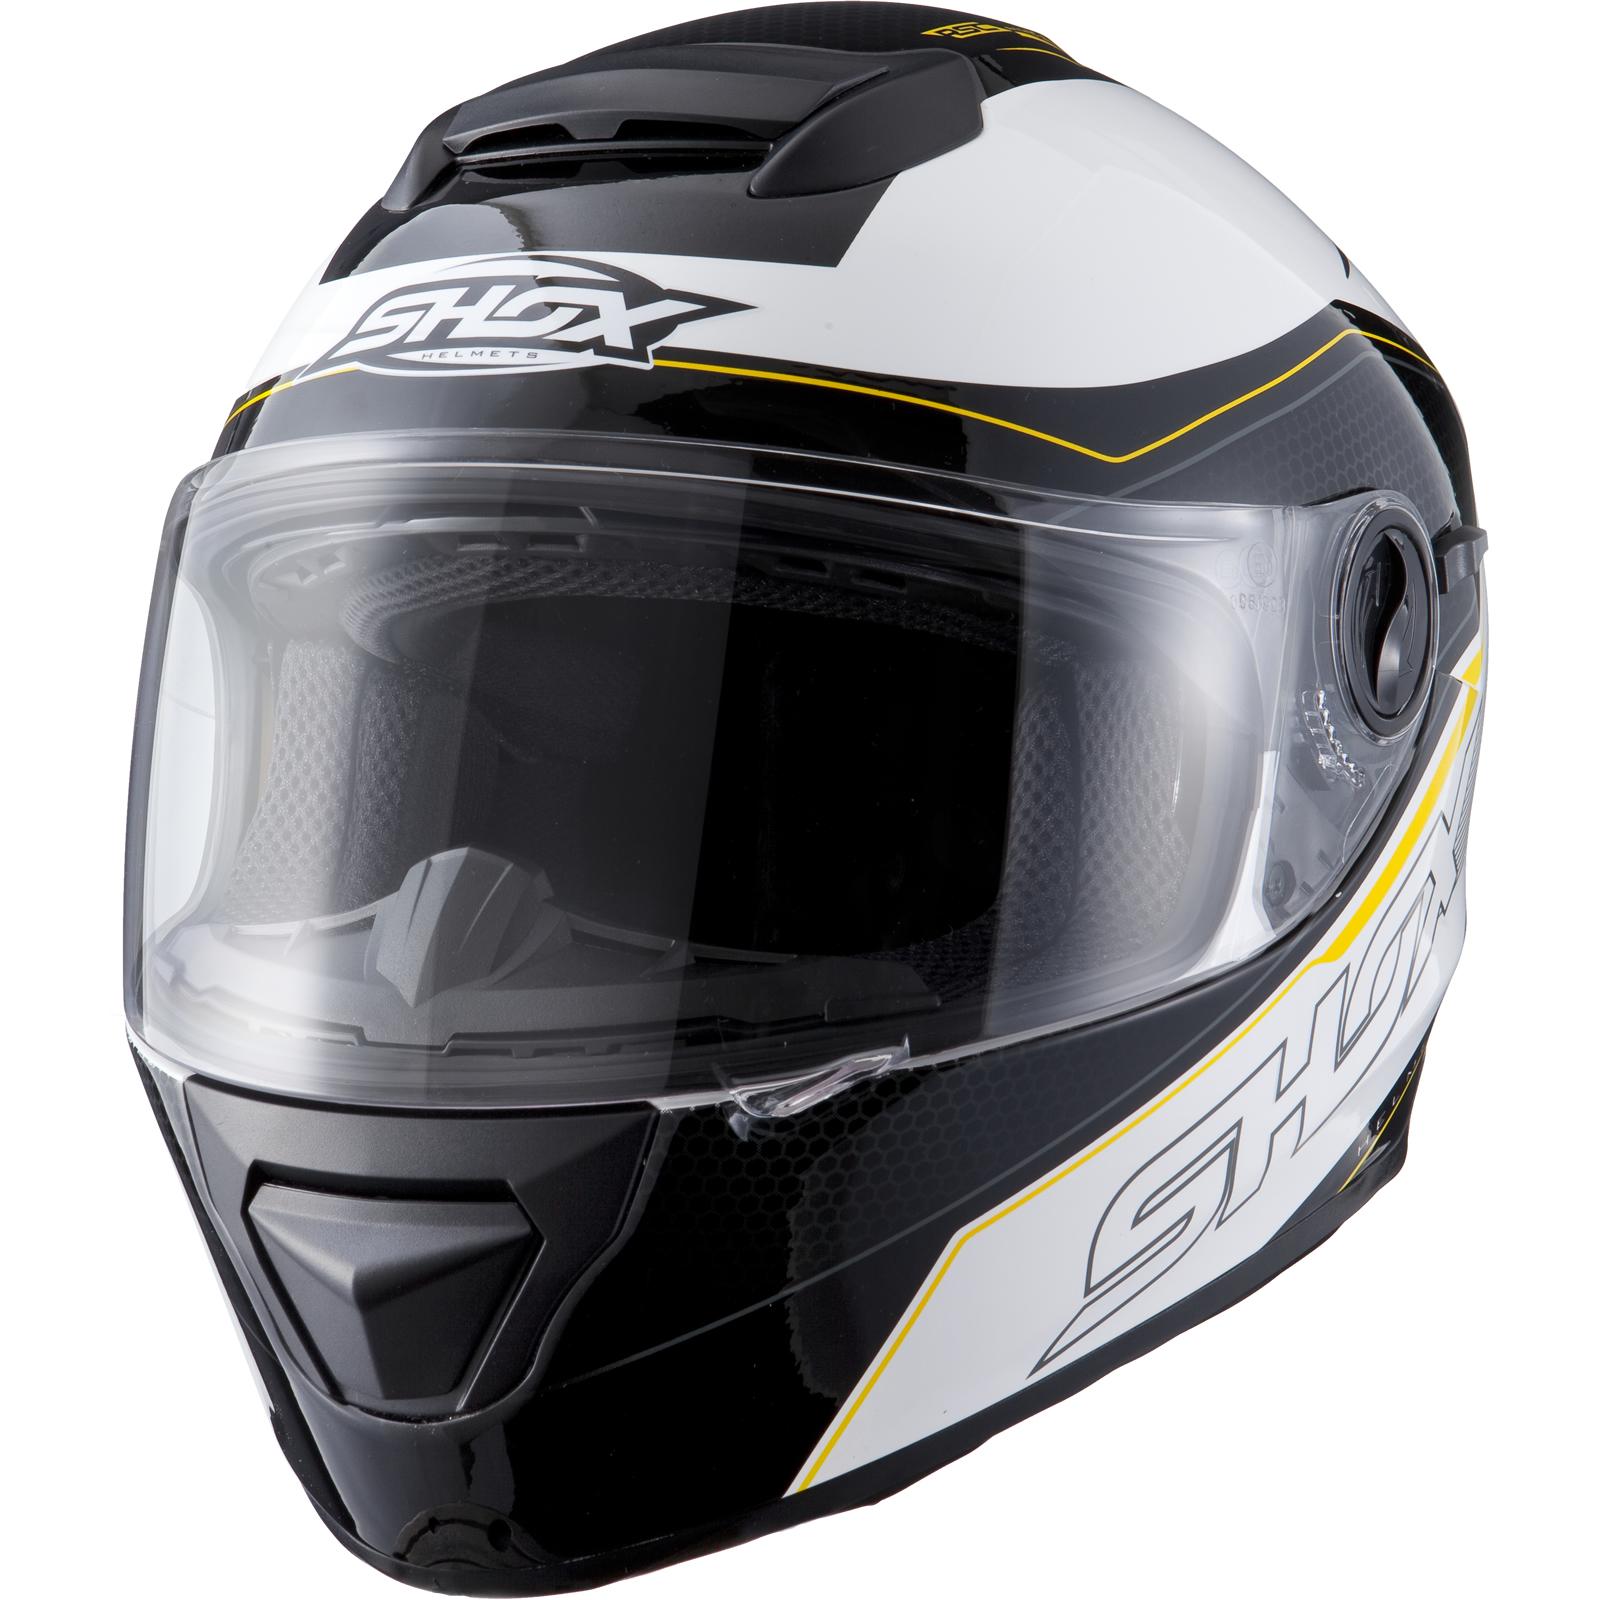 shox assault tracer sonnenblende motorrad roller mofa helm. Black Bedroom Furniture Sets. Home Design Ideas